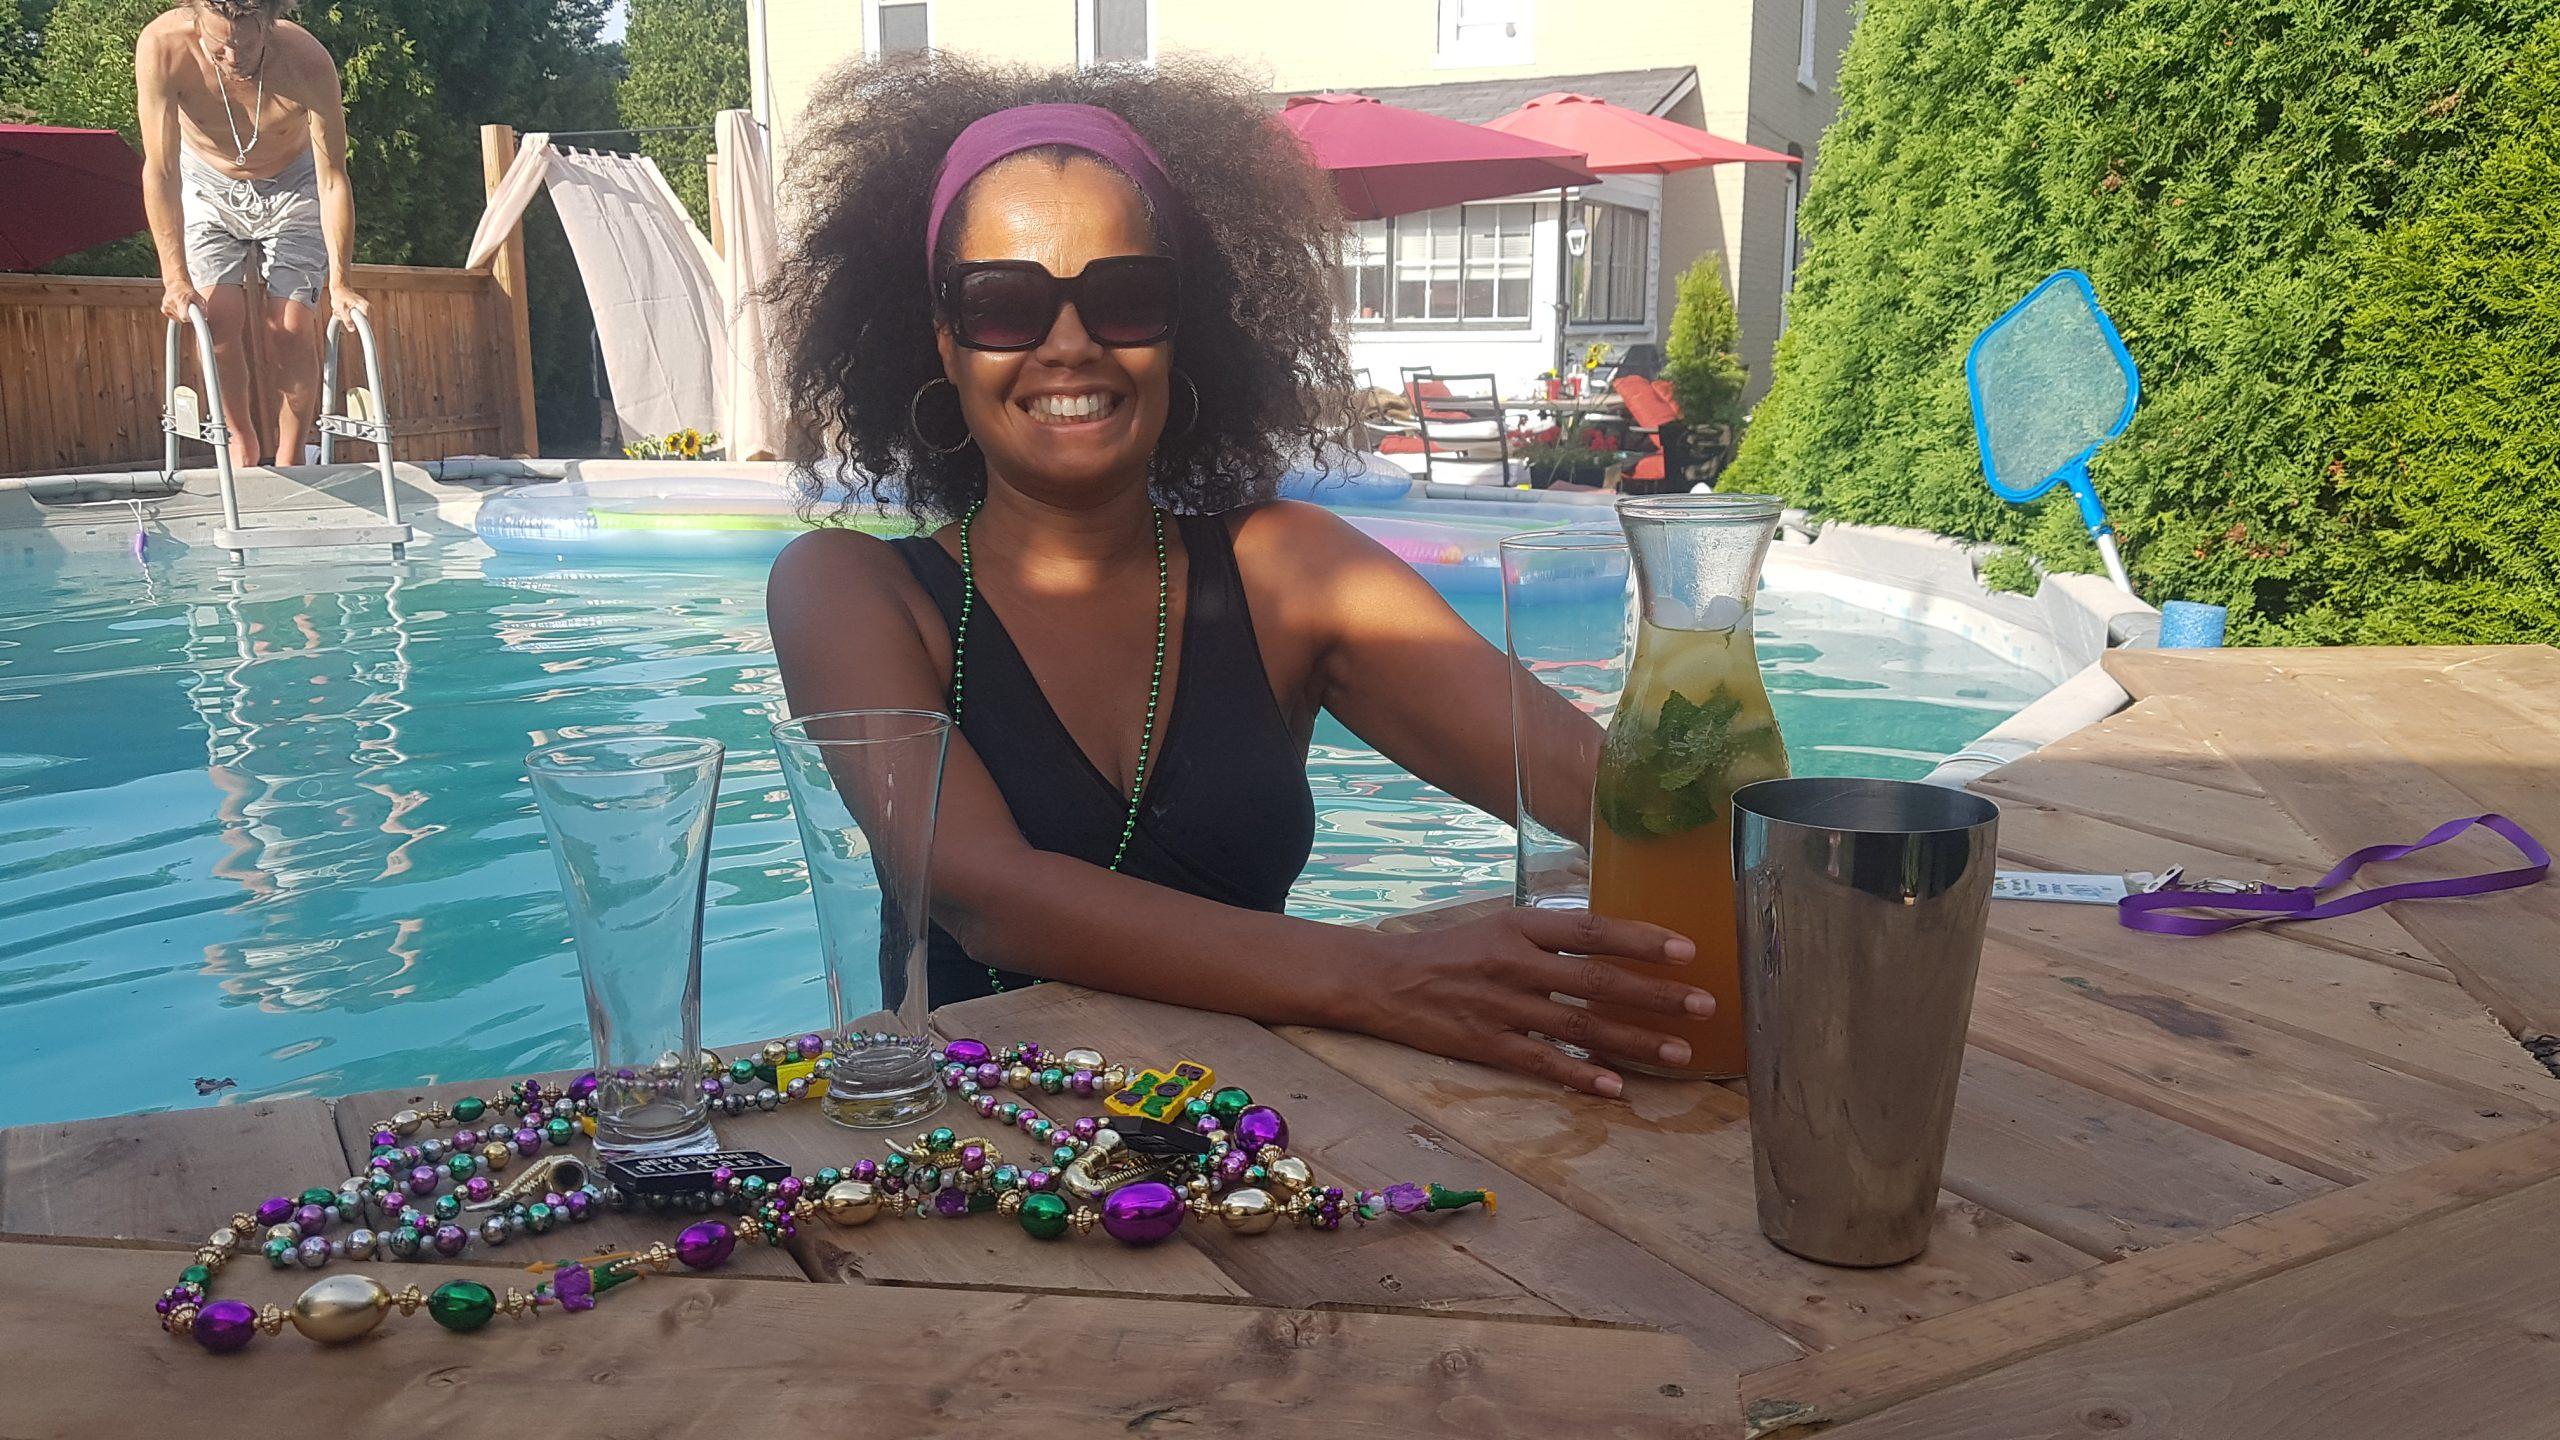 Juliet Dunn - Niagara's ONLINE Summer Mardi Gras - Saturday, July 18, 2020. Photo: Nicholas Paolone